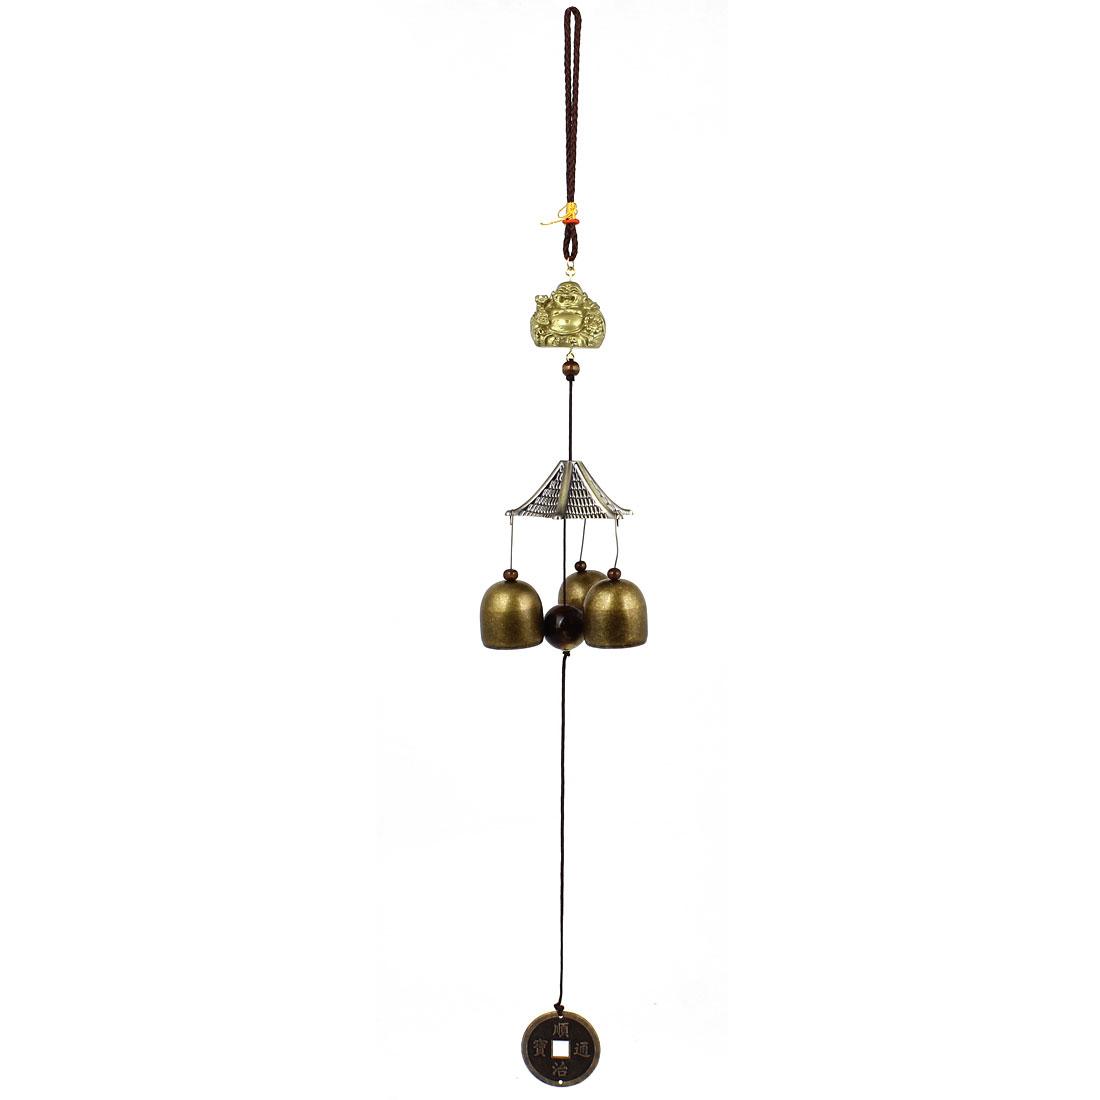 Buddha Copper Cash Three Jingle Bells Dangling Detail Decor Bronze Tone Windbell